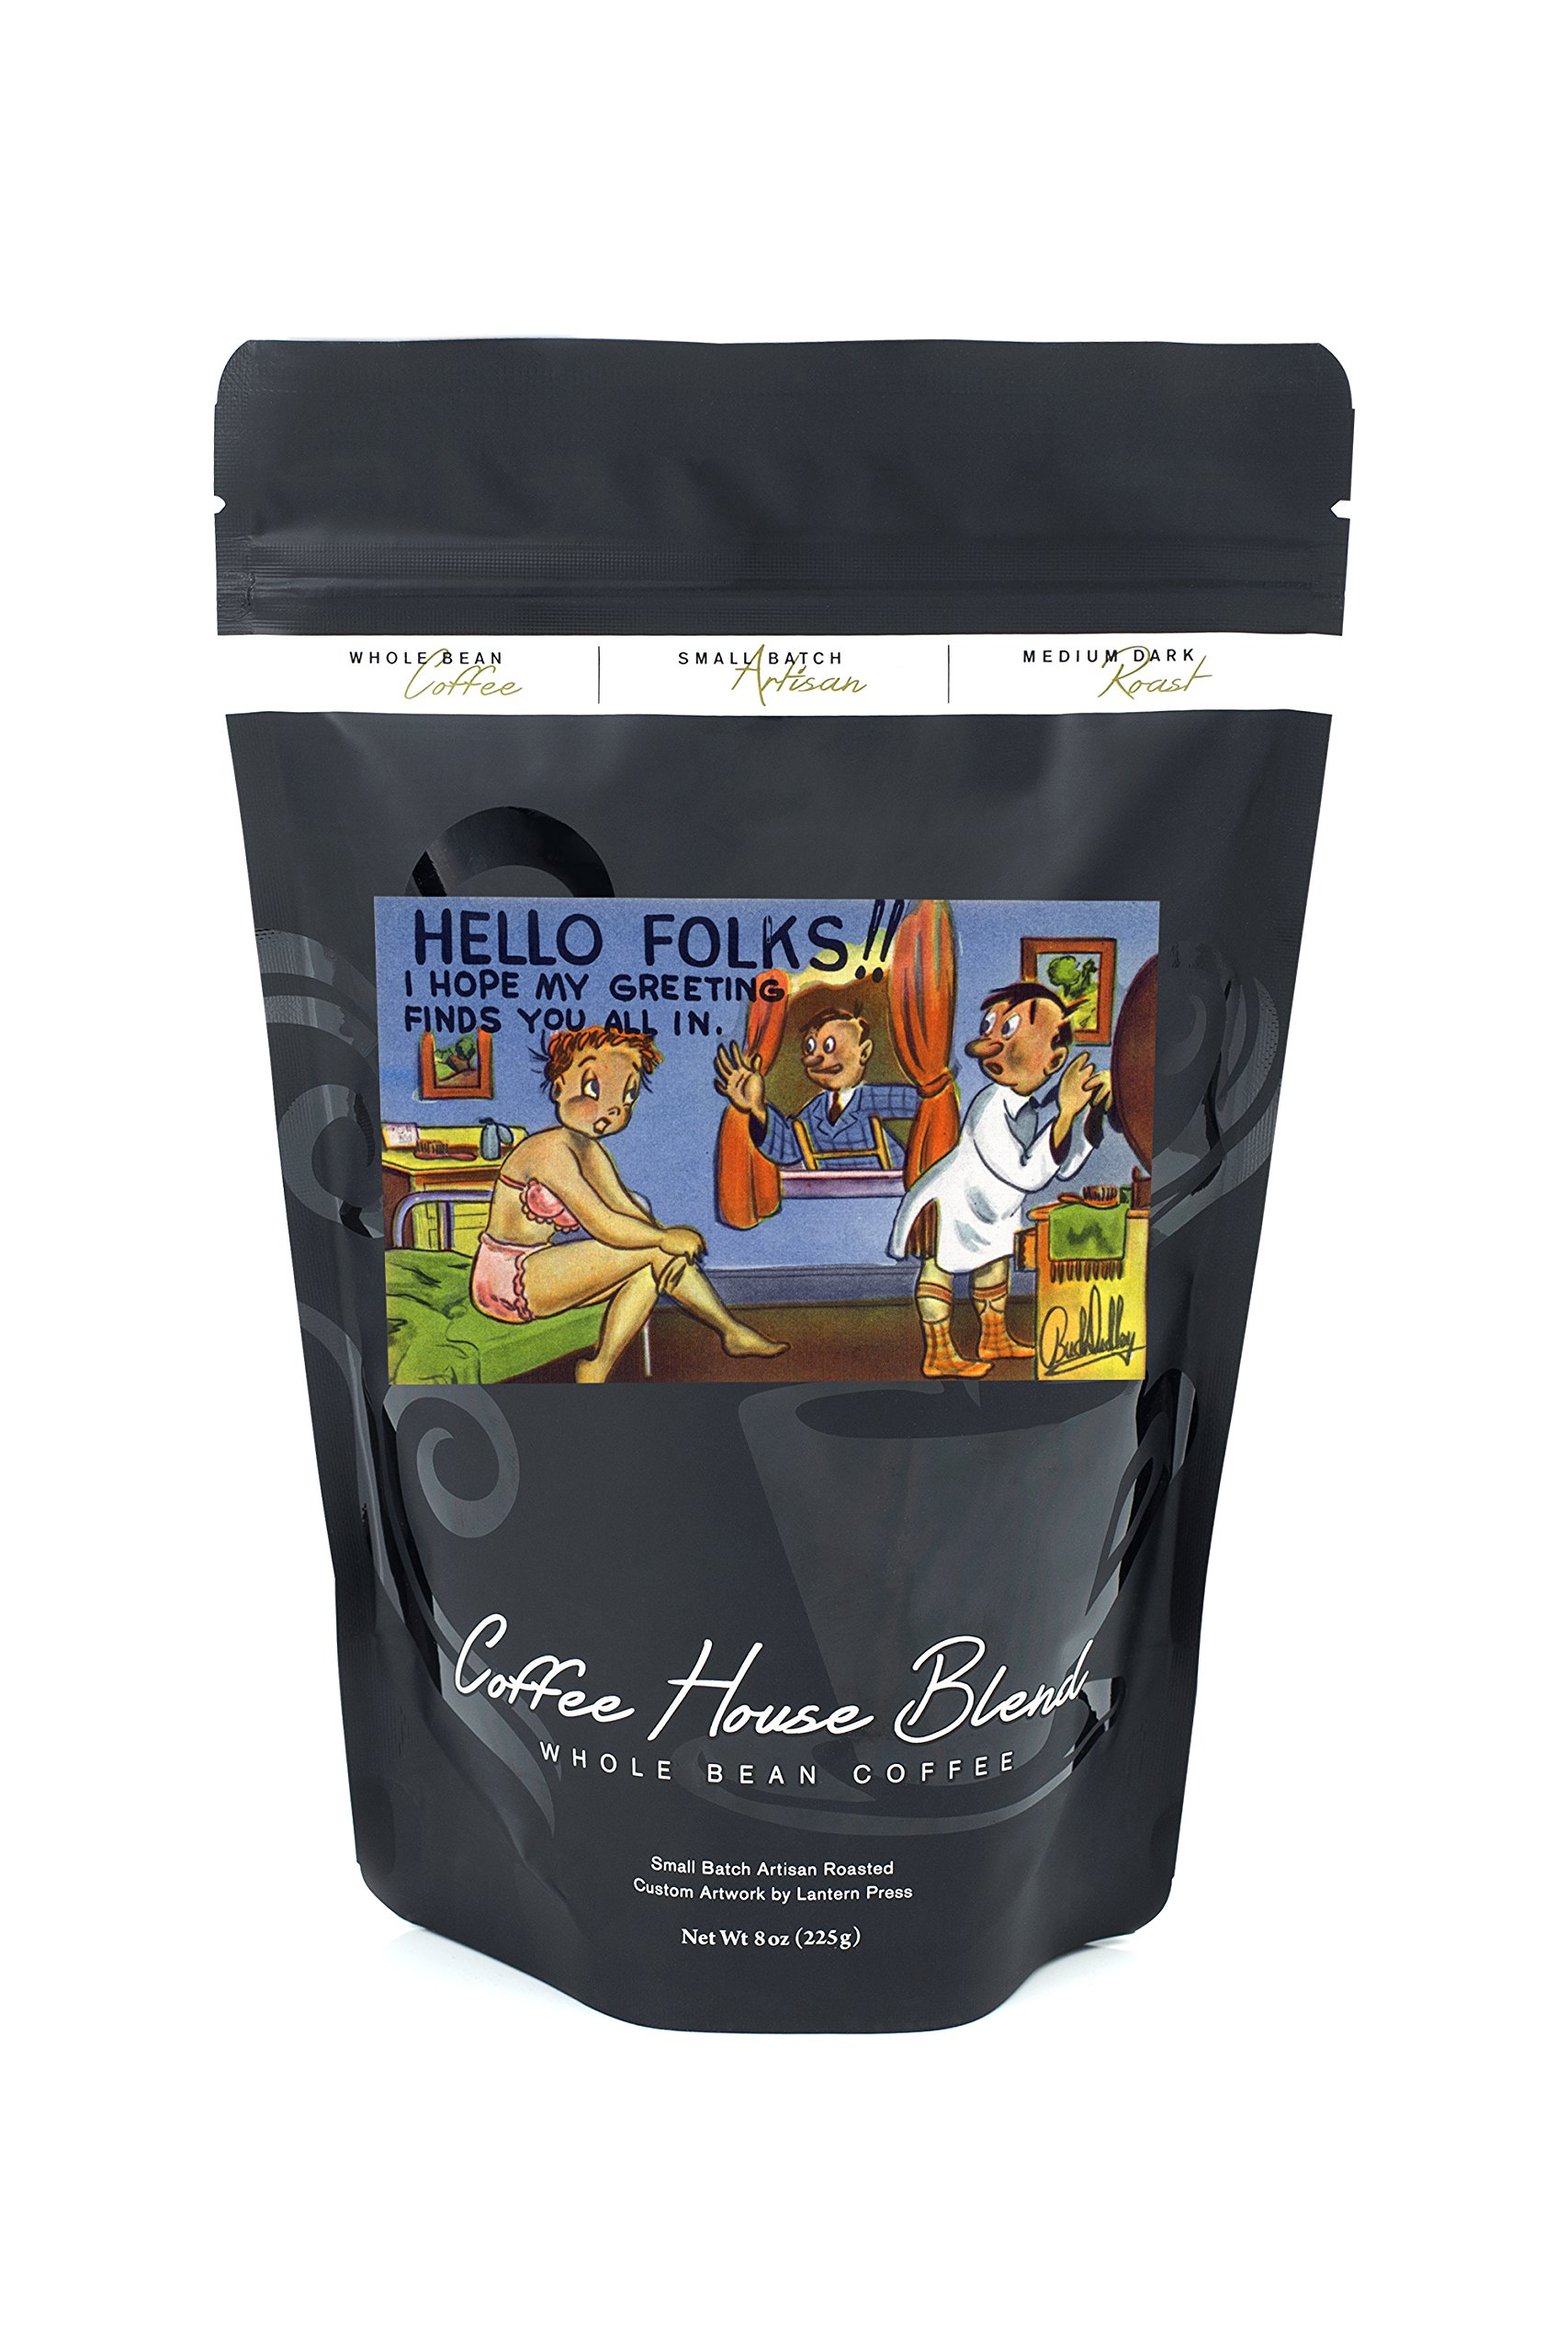 Comical Cartoon - Man on Ladder in Window, Couple Getting Dressed, Greetings (8oz Whole Bean Small Batch Artisan Coffee - Bold & Strong Medium Dark Roast w/Artwork)